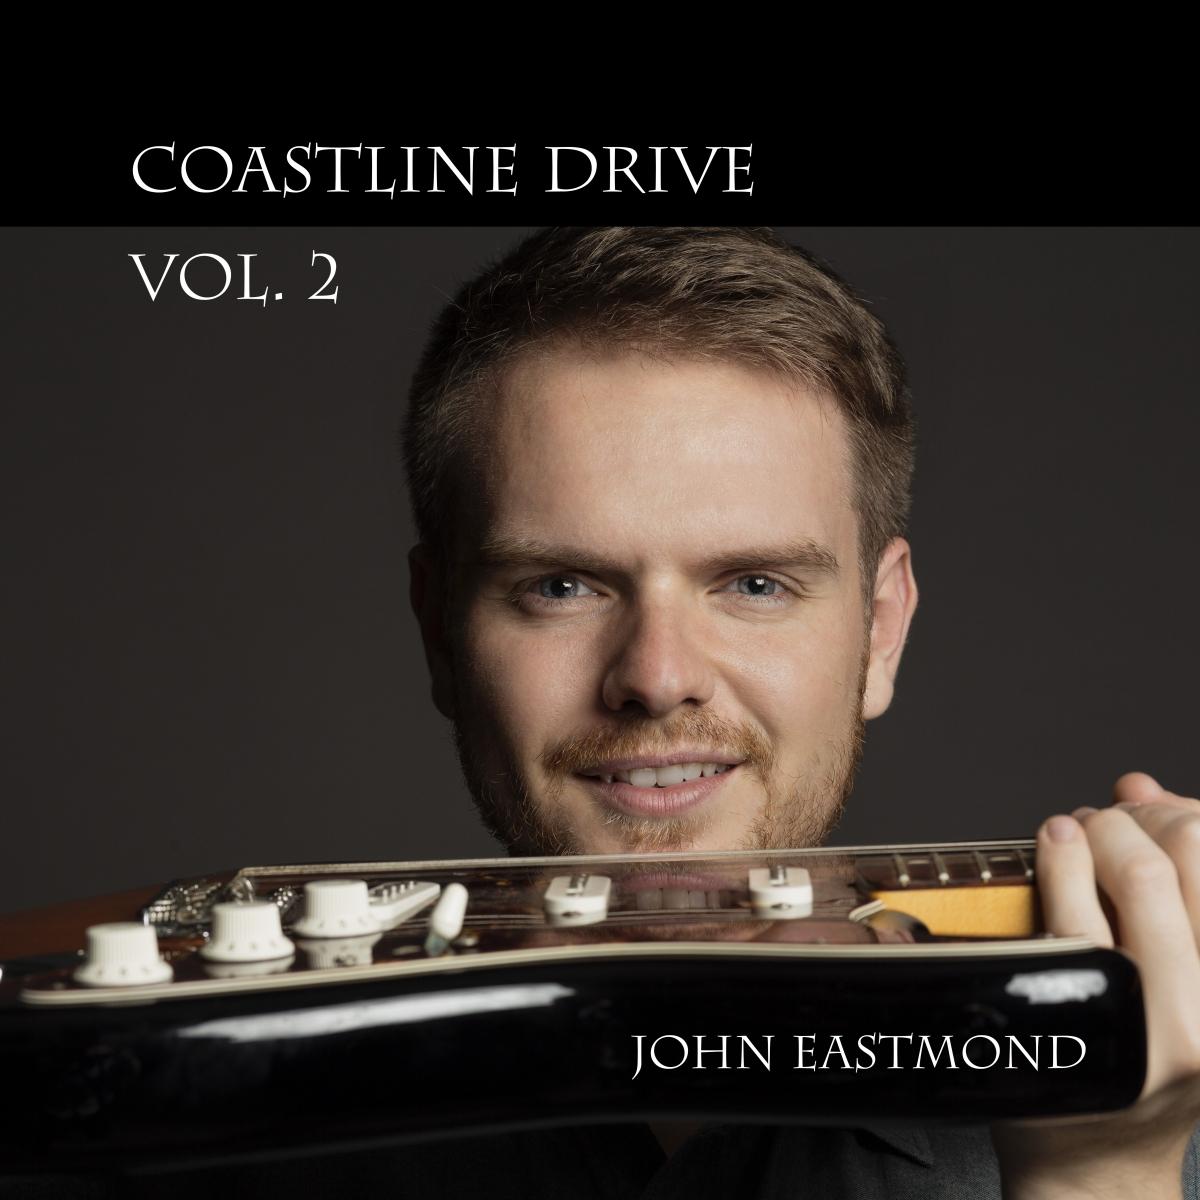 Coastline Drive Vol. 2